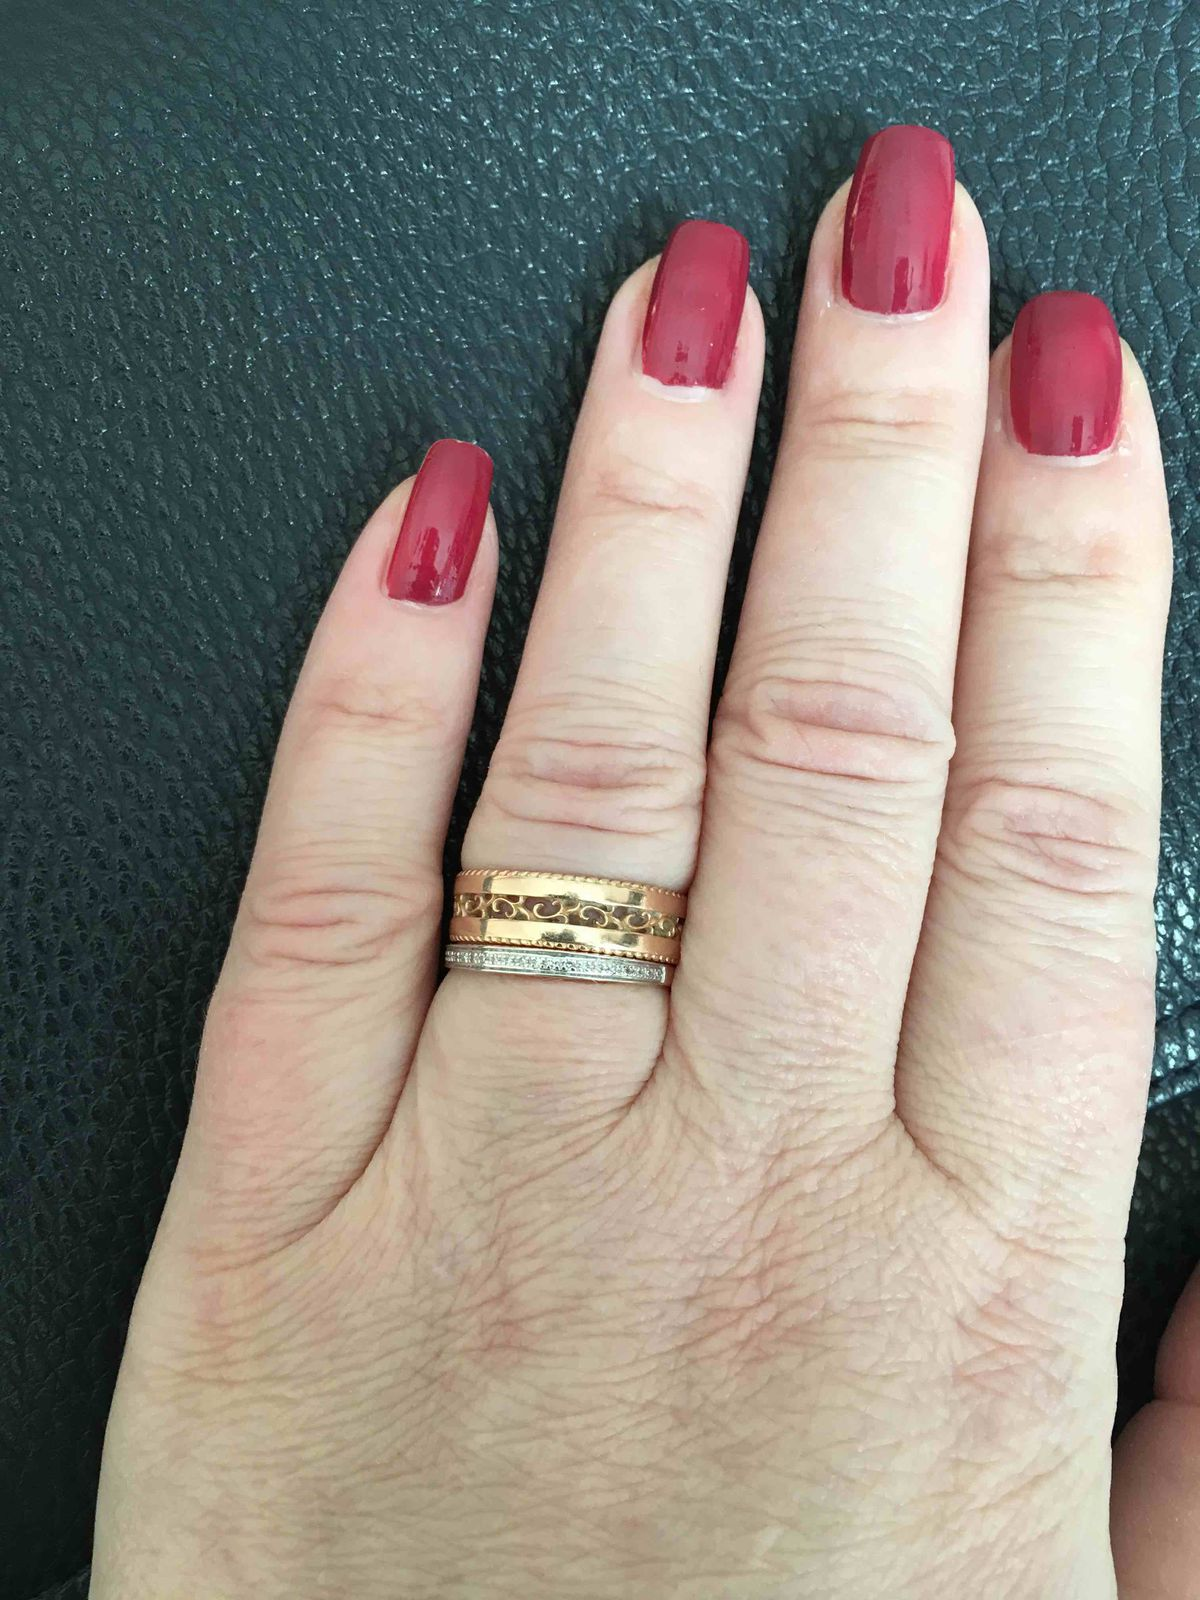 Кольцо , как палочка- выручалочка